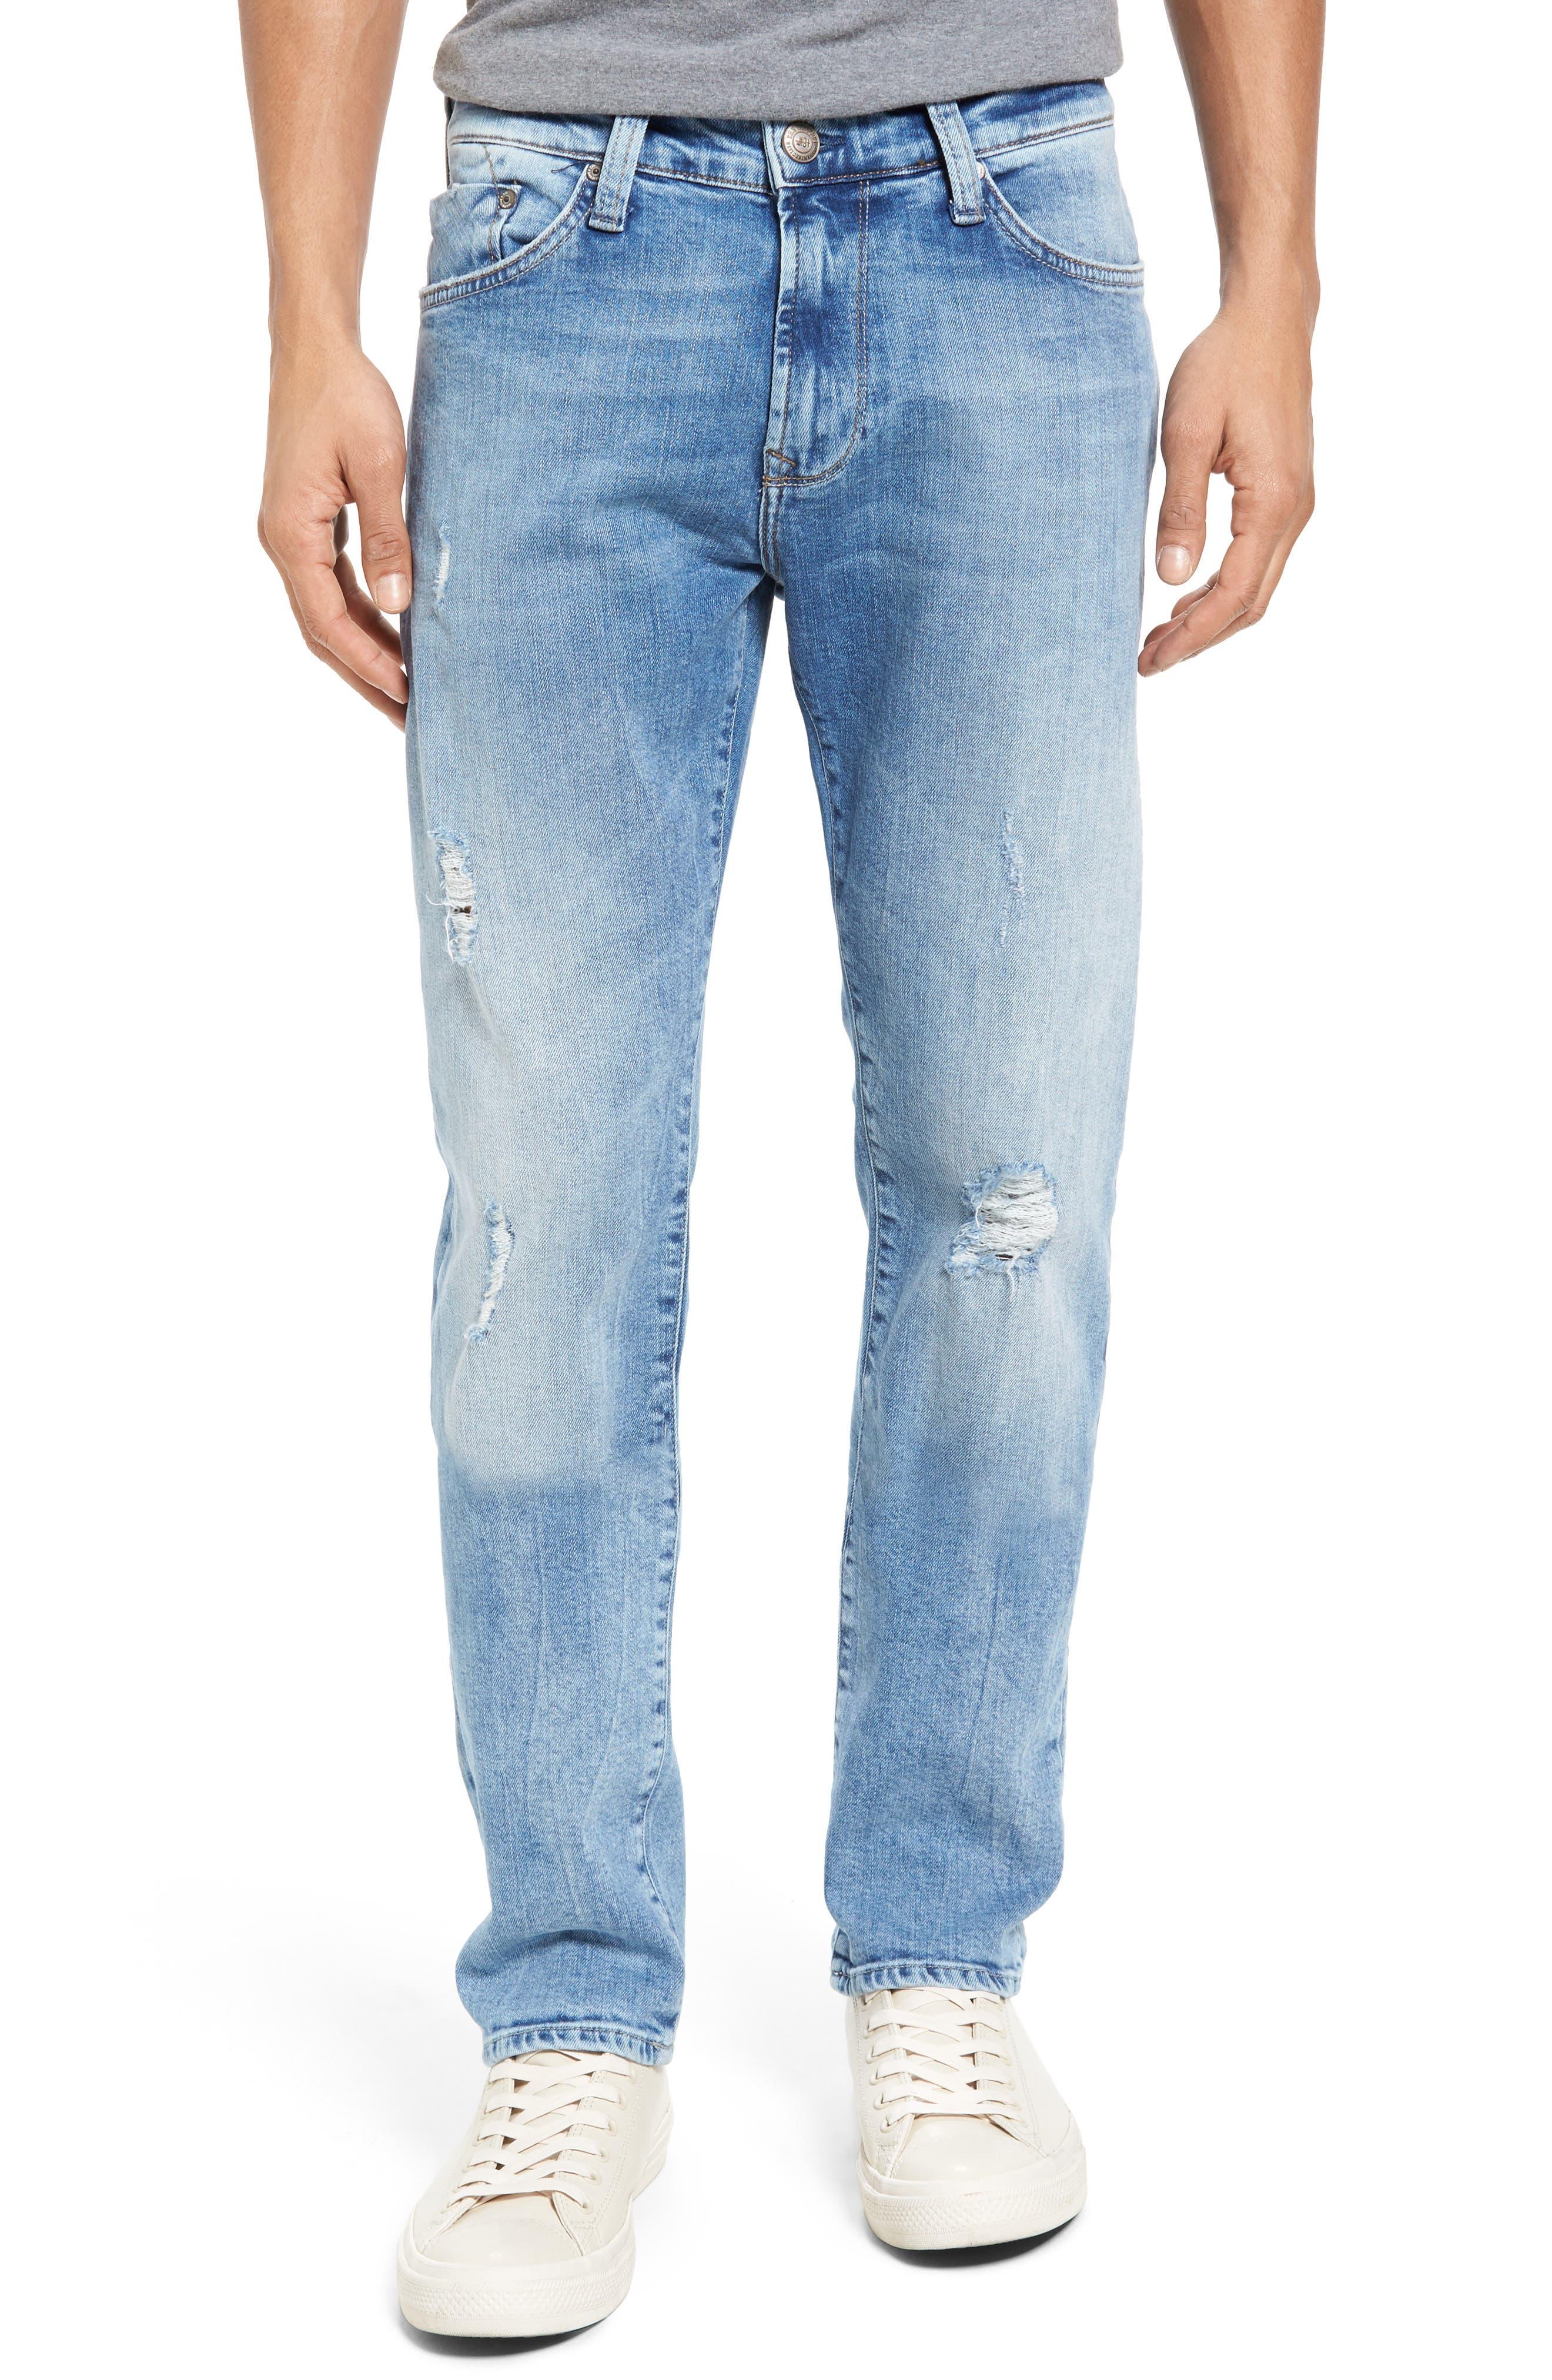 Alternate Image 1 Selected - Mavi Jeans Jake Easy Slim Fit Jeans (Ripped)